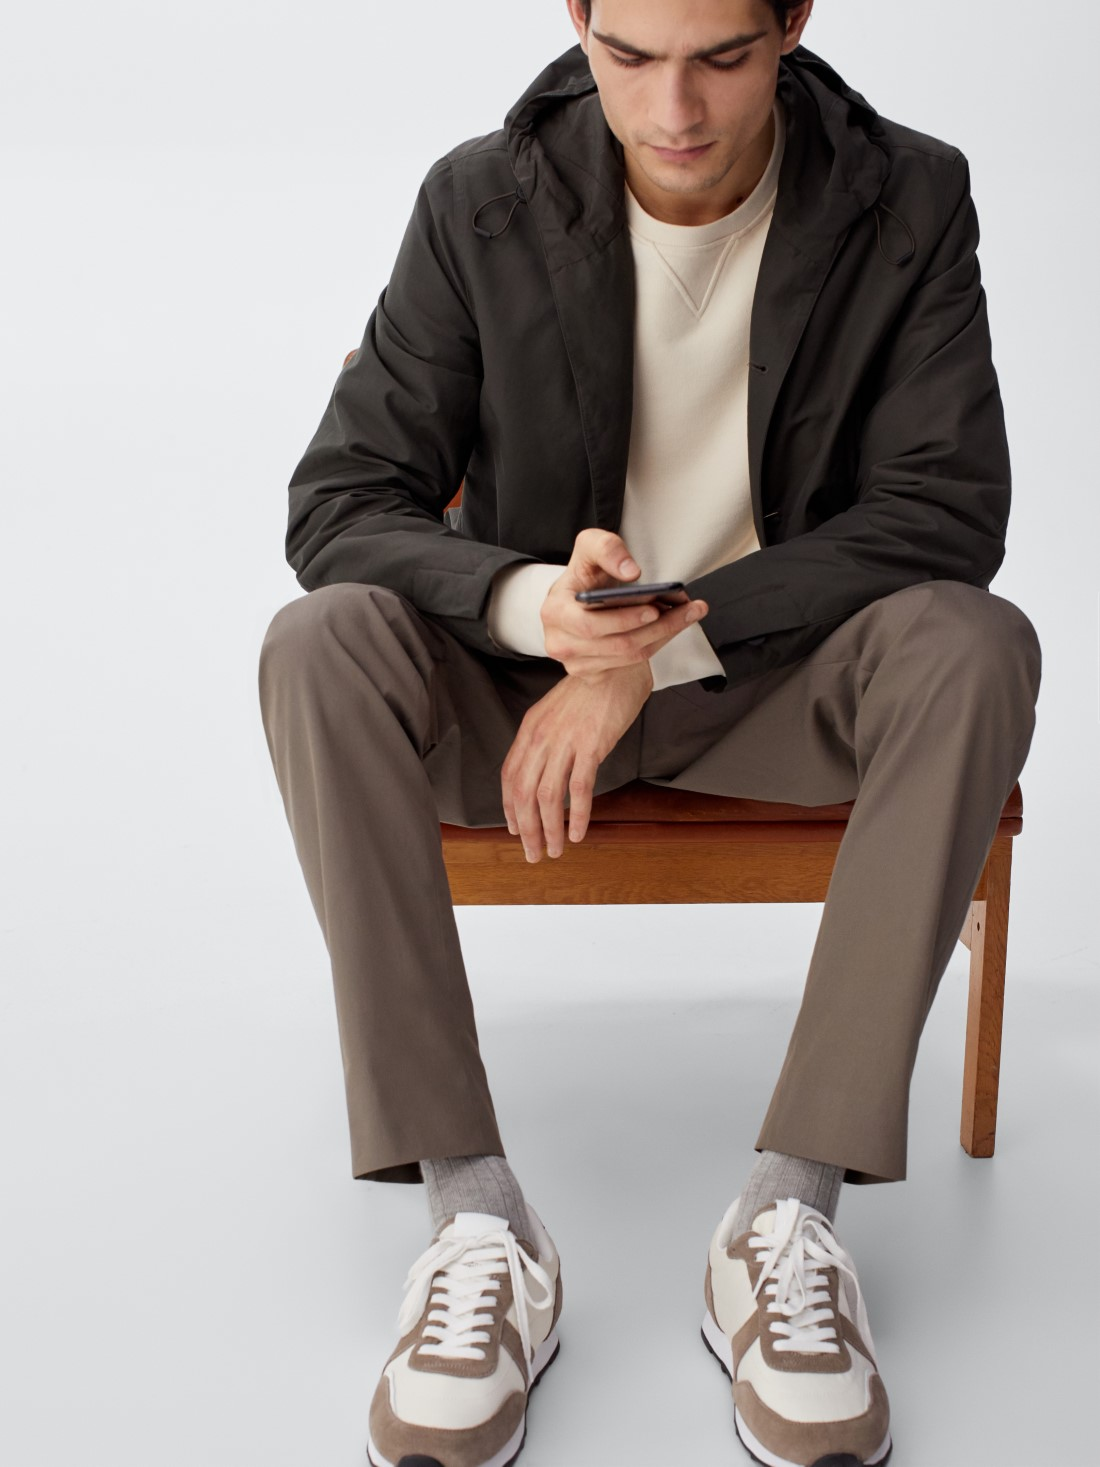 Massimo Dutti - Shoes Experience